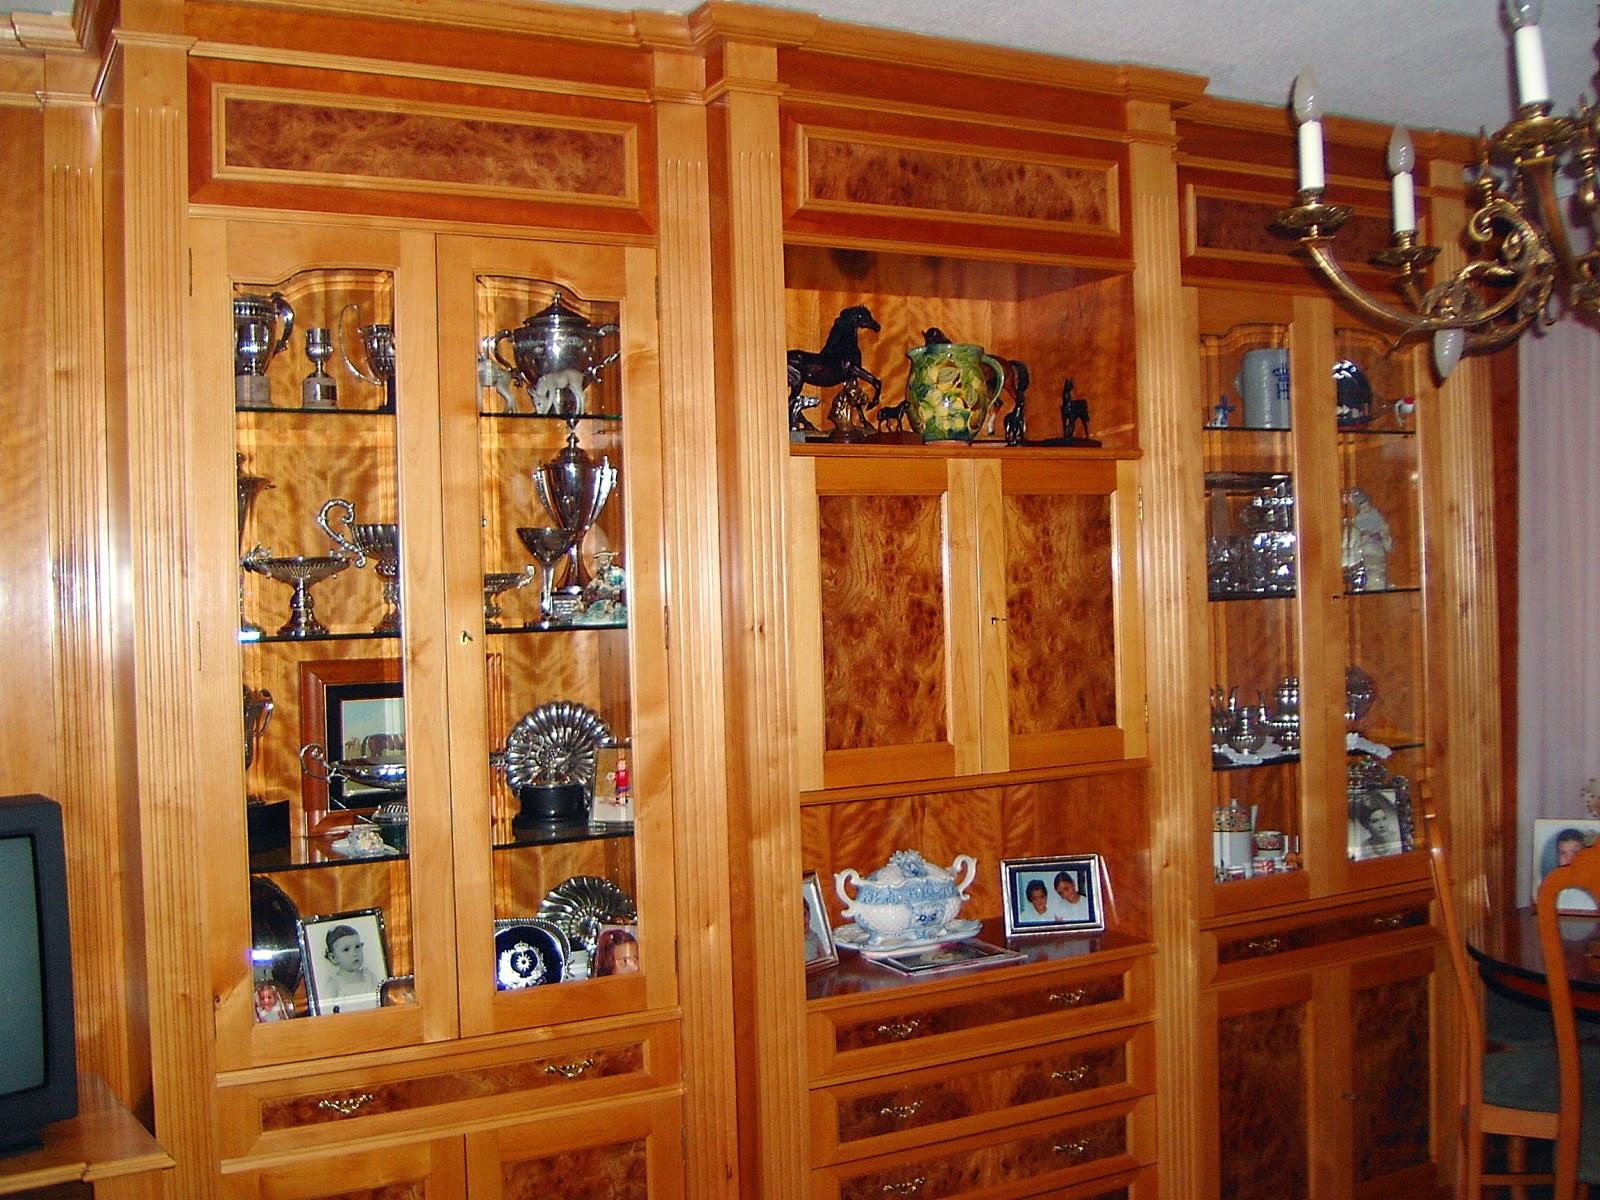 Librer as a medida en madrid muebles de madera fabritecma - Muebles a medida en madrid ...